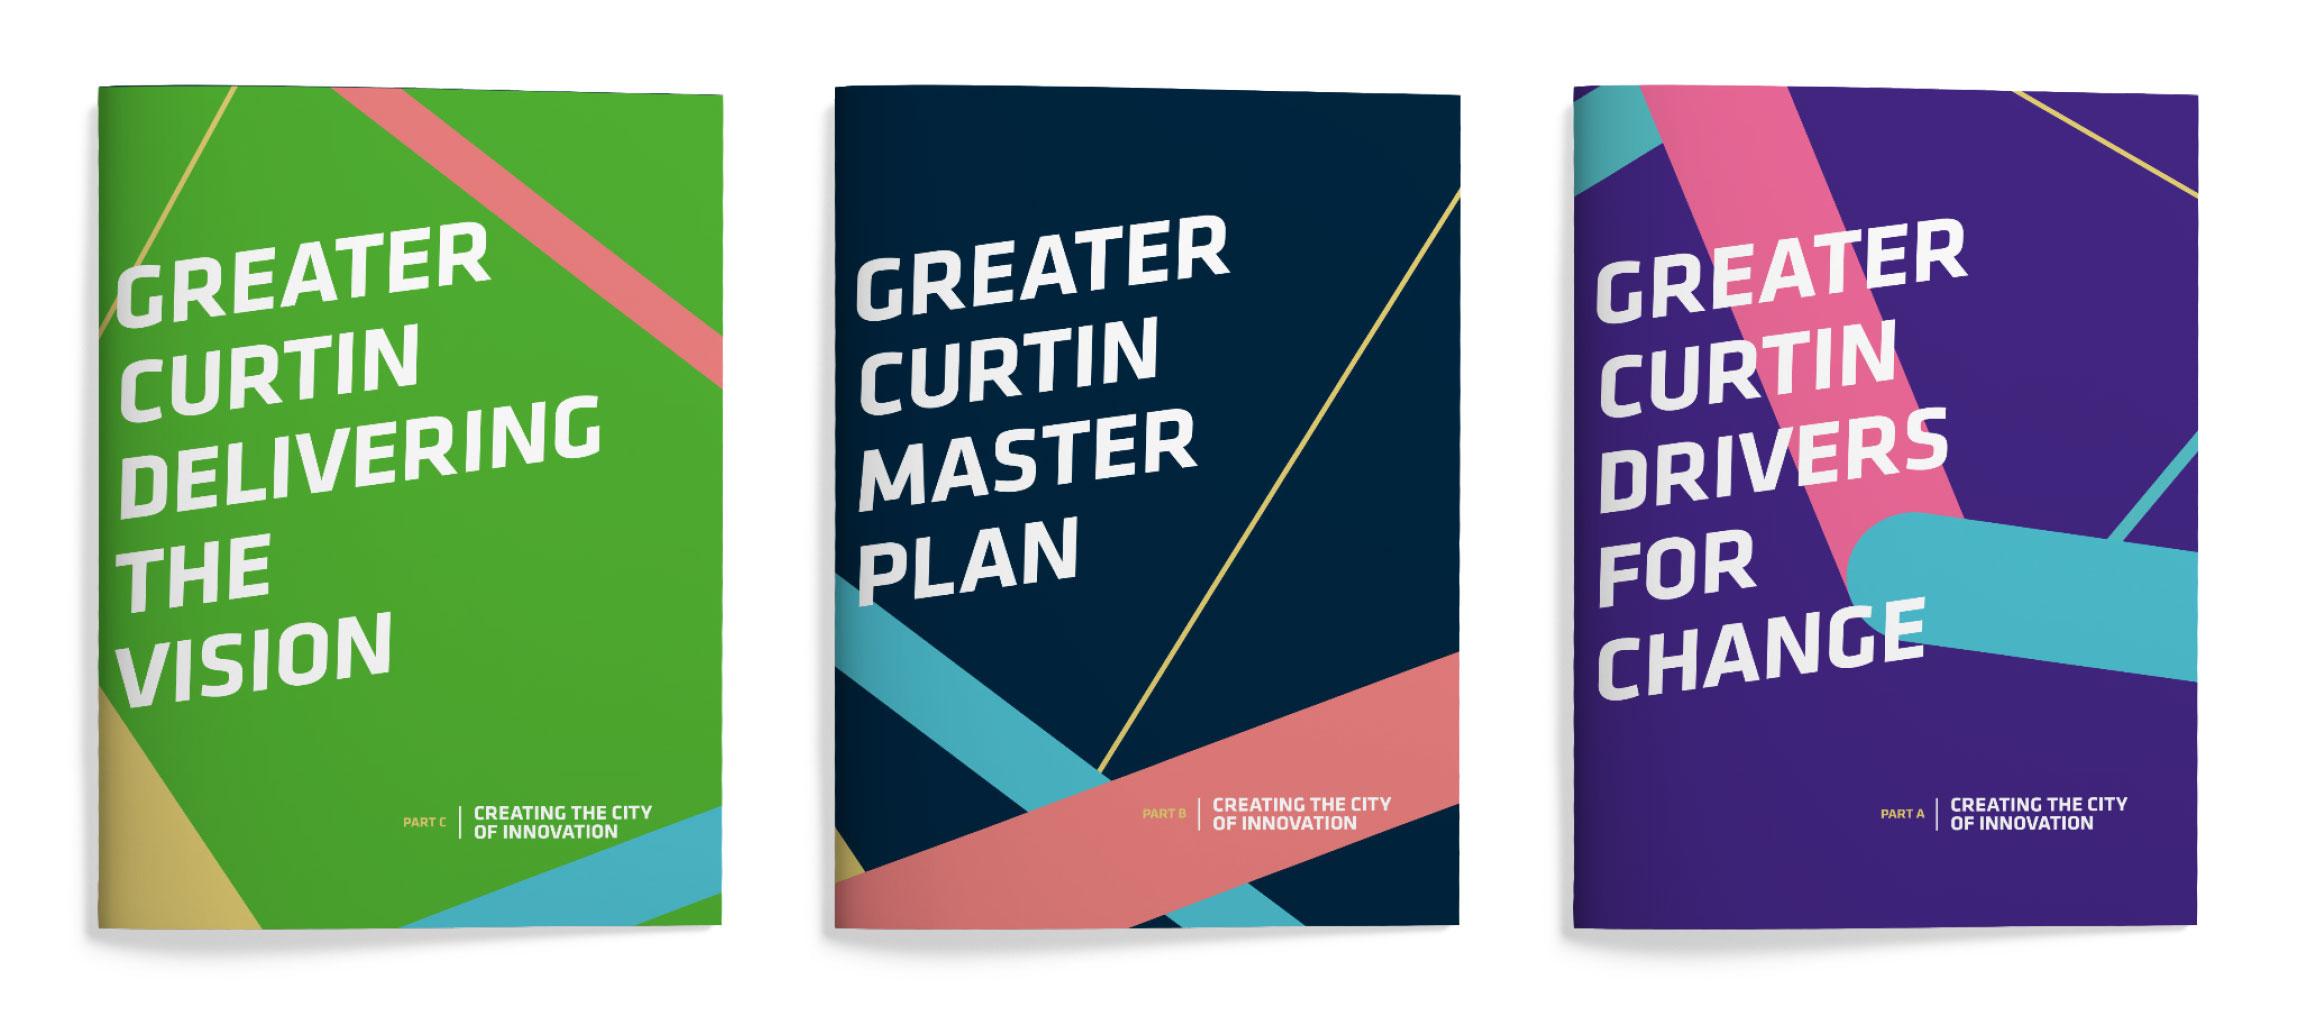 Masterplan_Docs.jpg